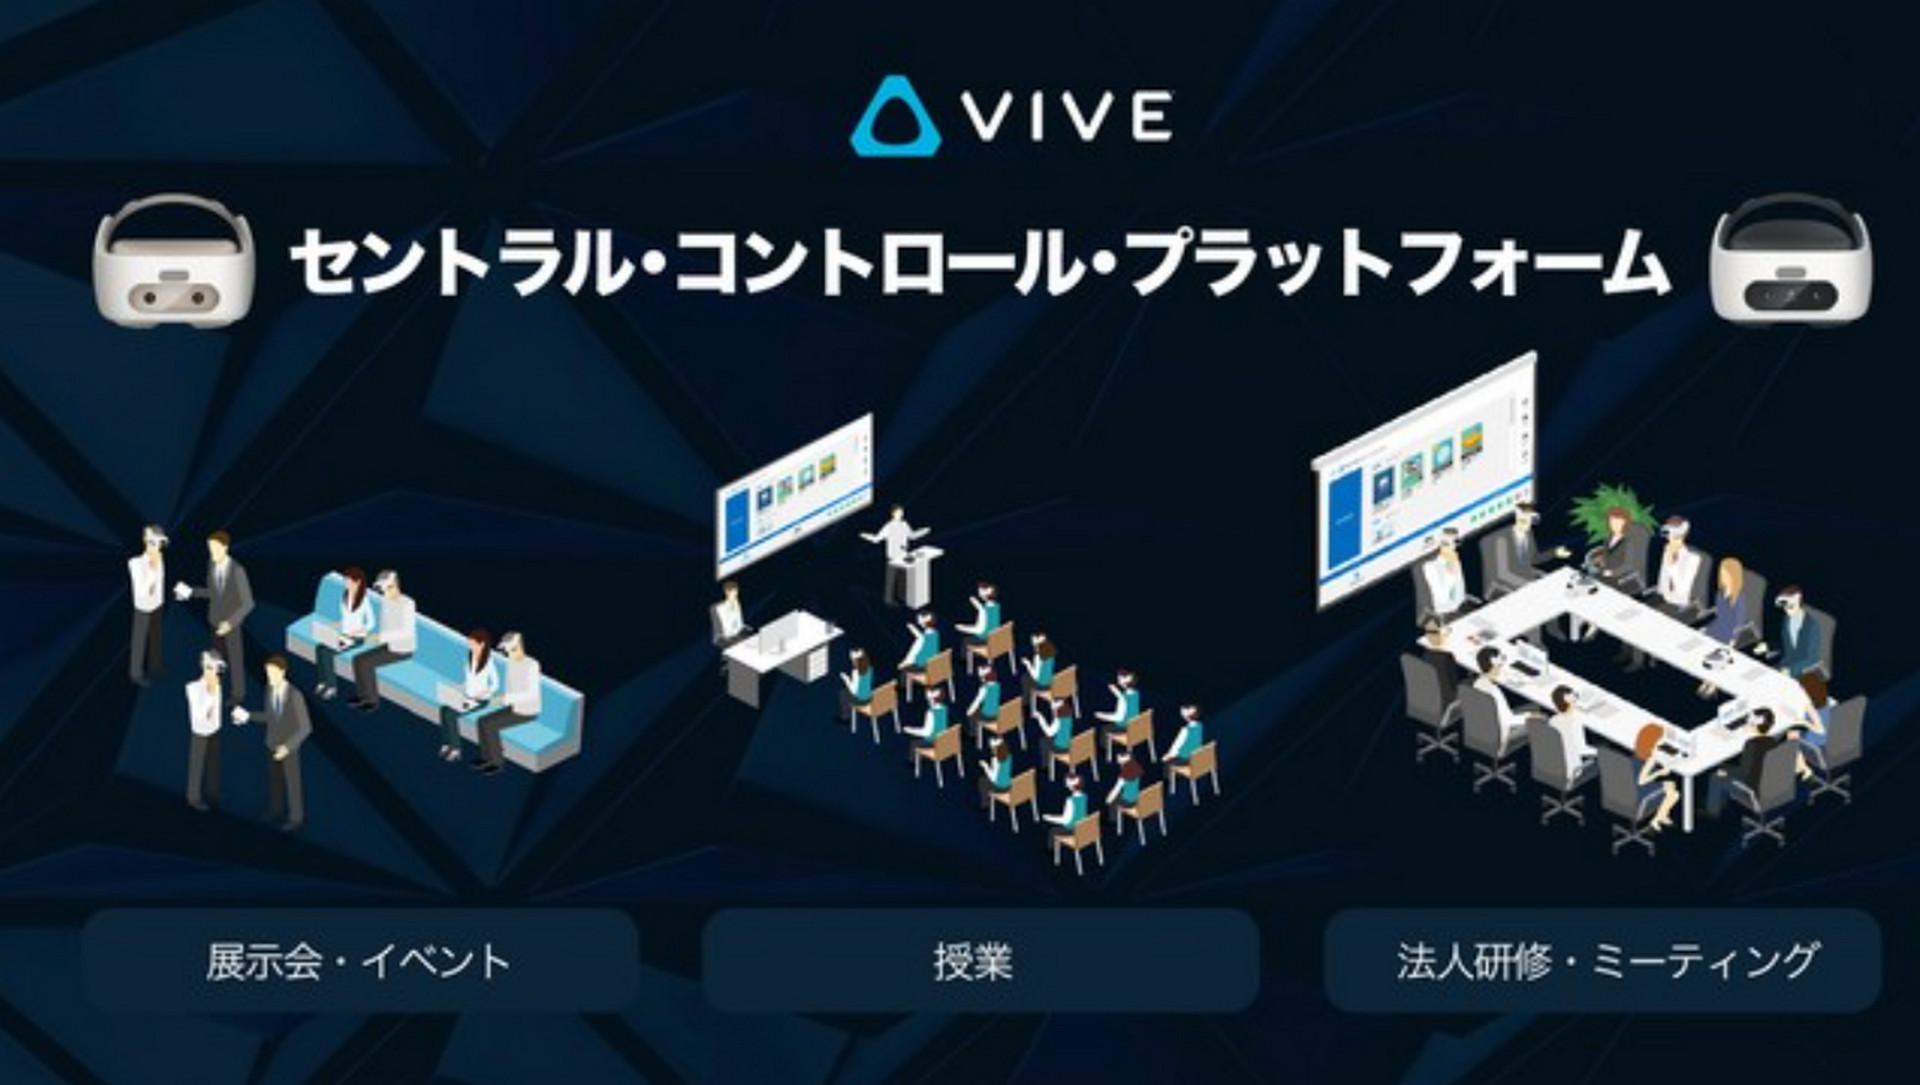 VIVE Central Control Platform